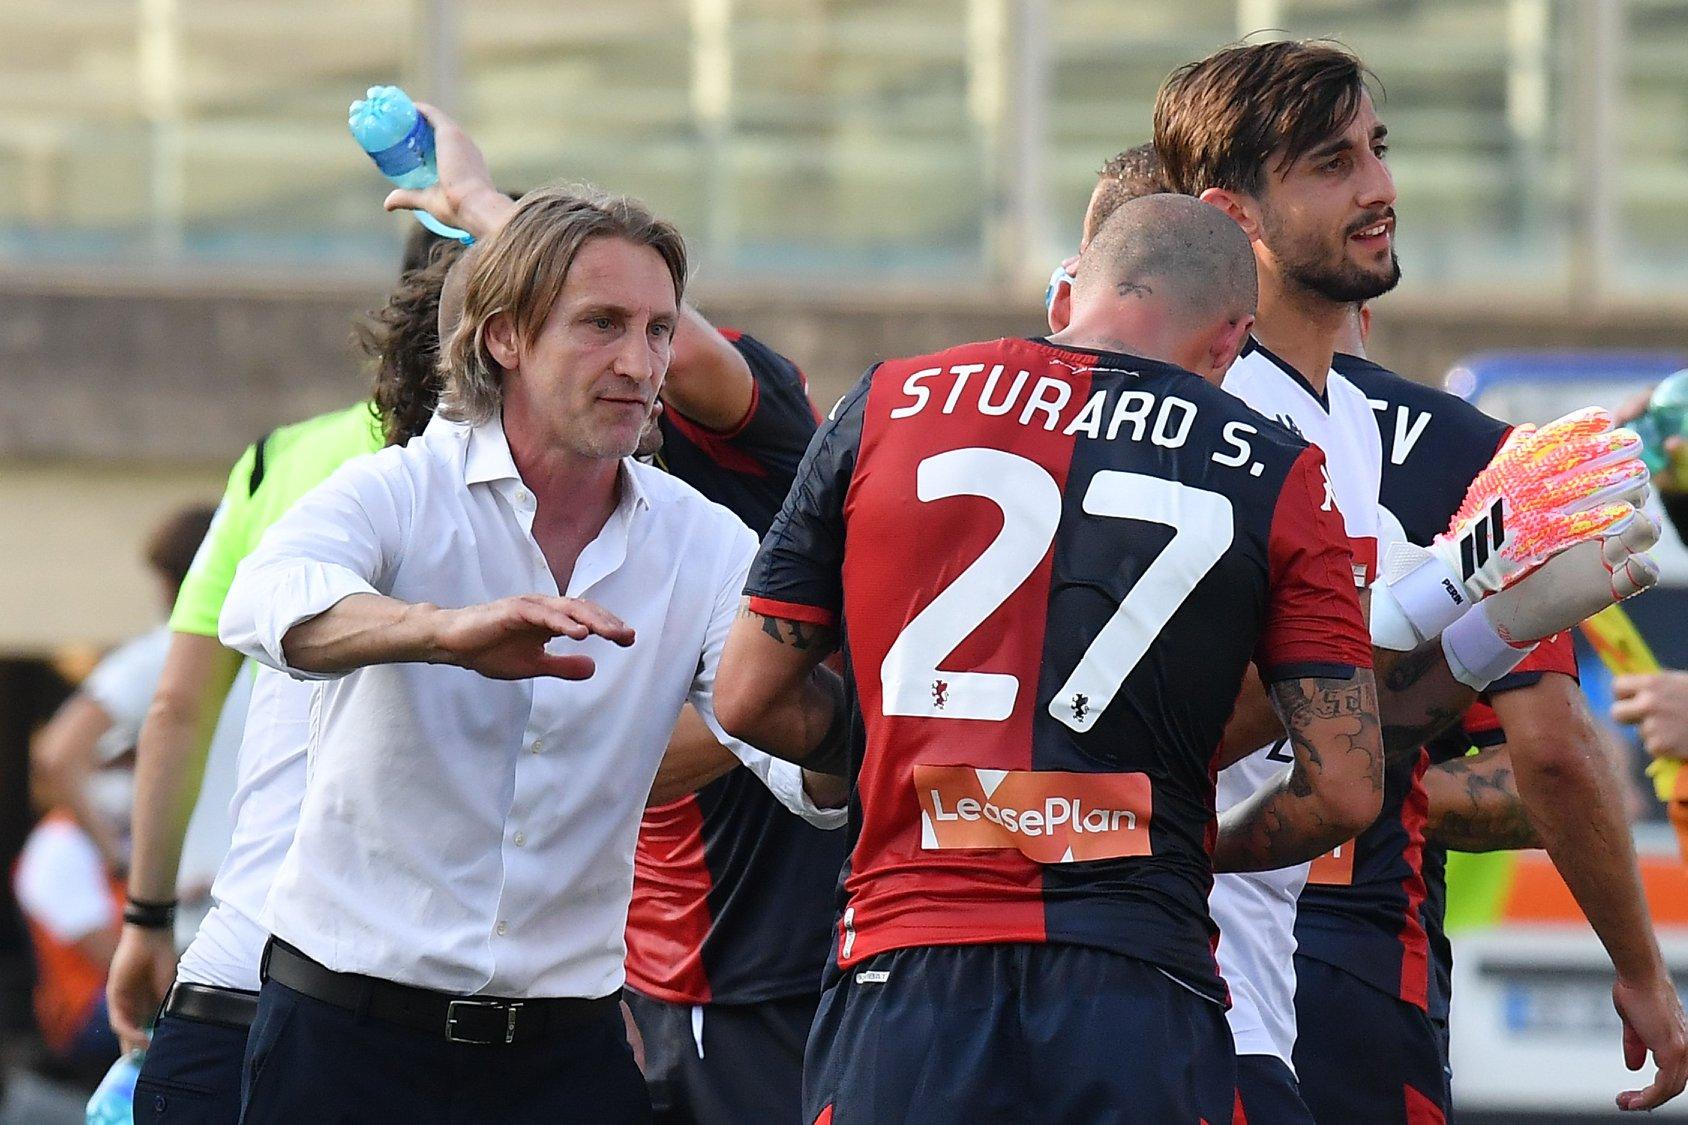 Nicola Sturaro Genoa